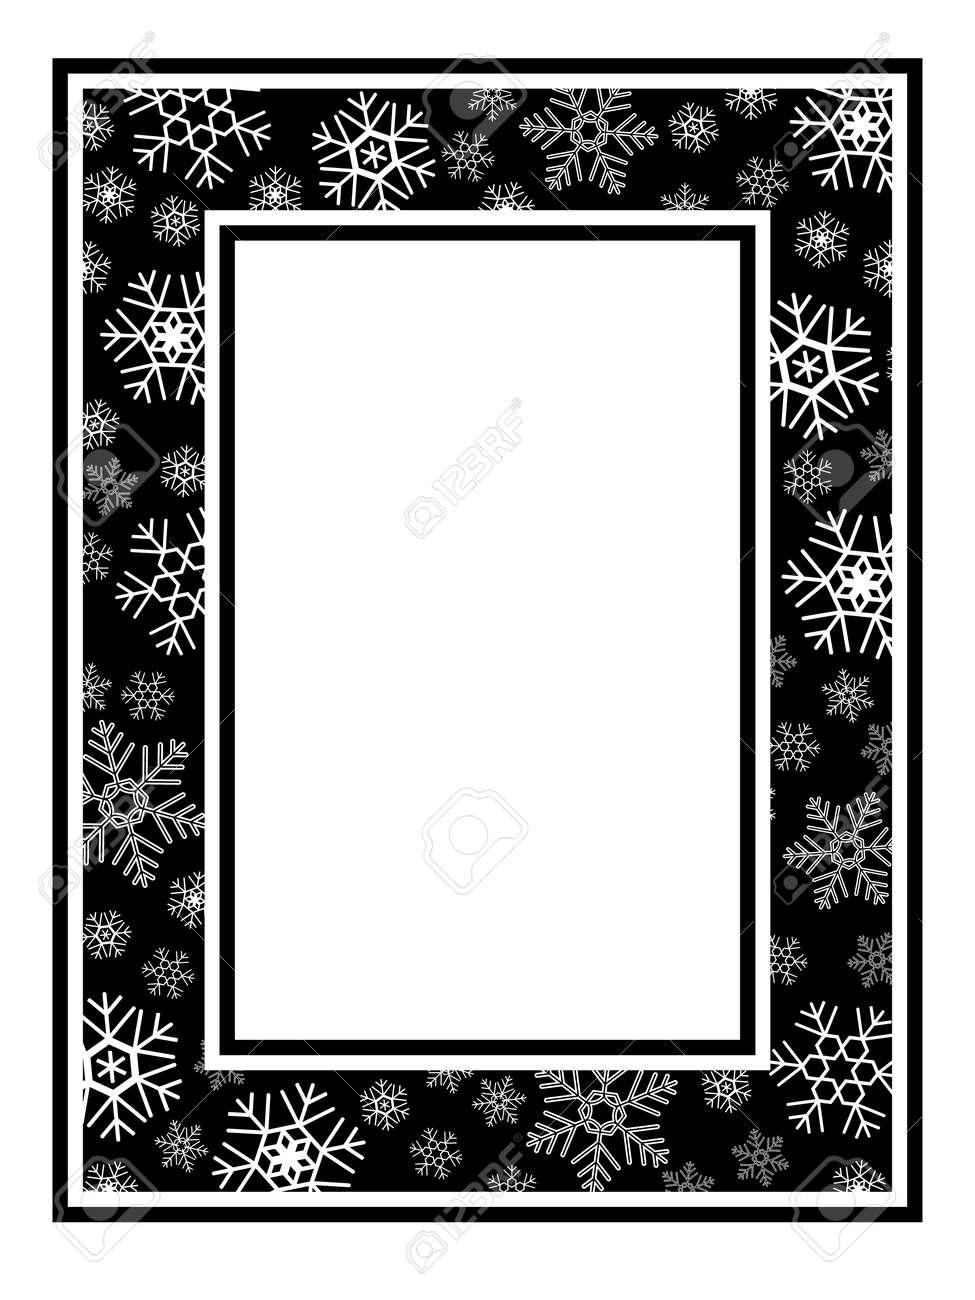 Christmas Wide Frame Snowflake Pattern Black White Royalty Free ...